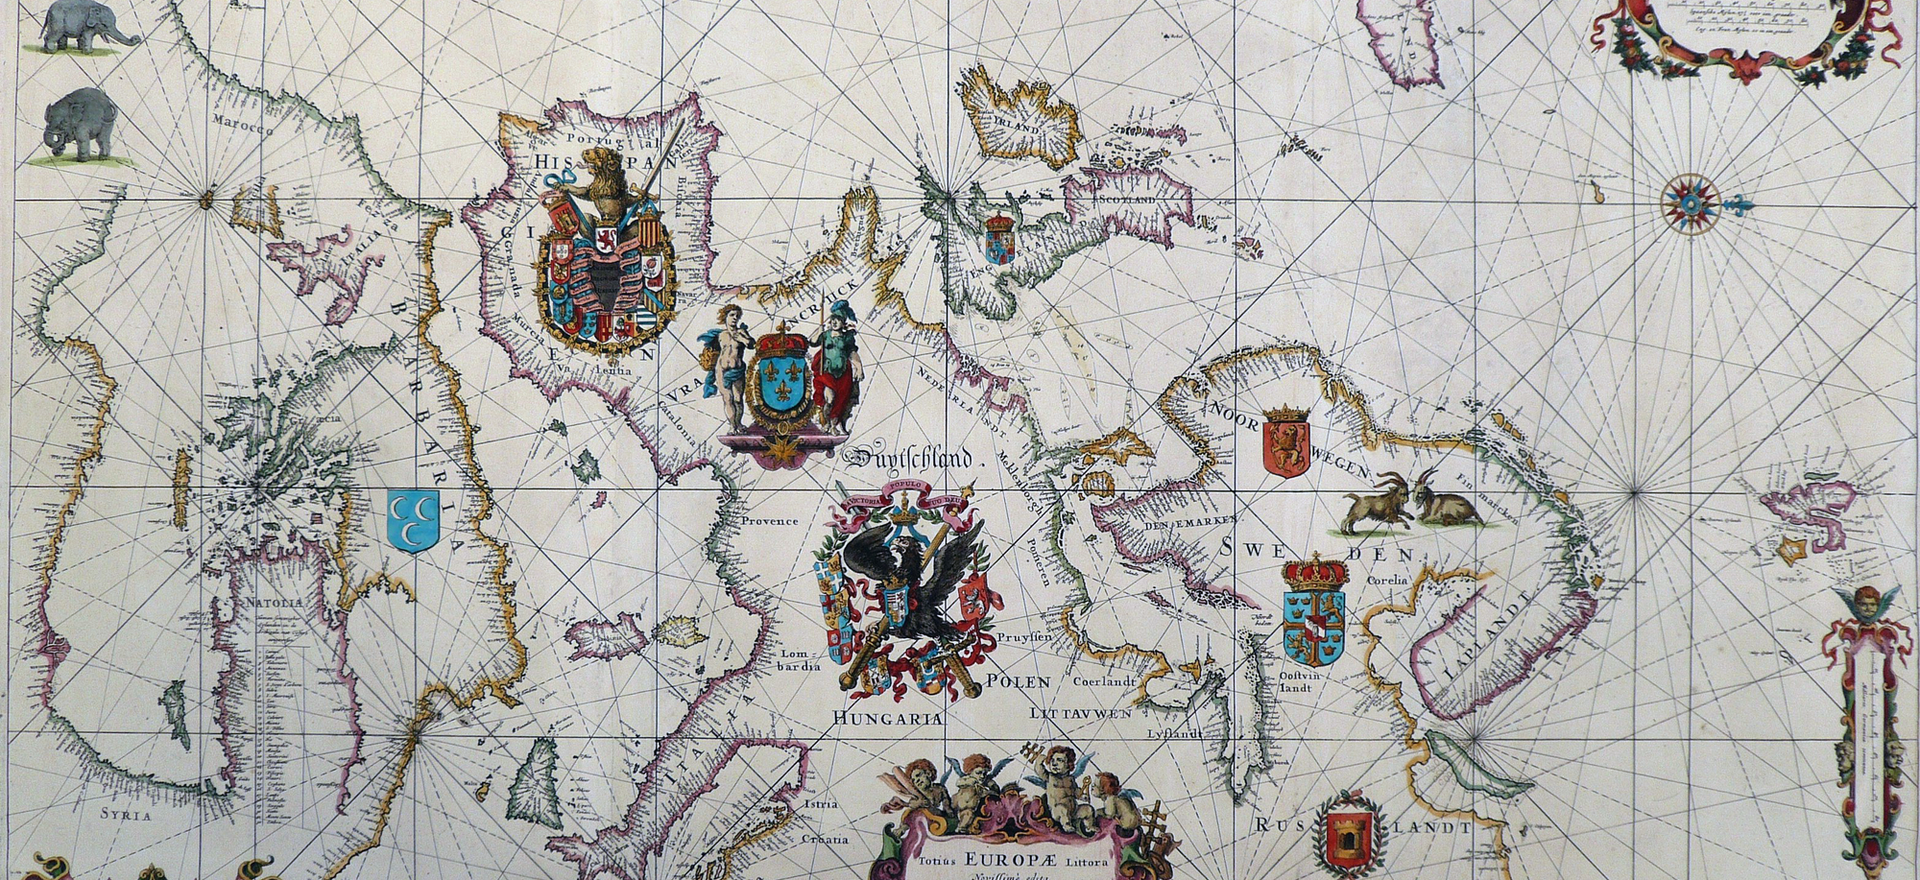 Totius Europae Littora Novissime Edita. Pascaert Vertoonende alle de See-Custen van Europa. Frederick de Wit, Amsterdam 1675.